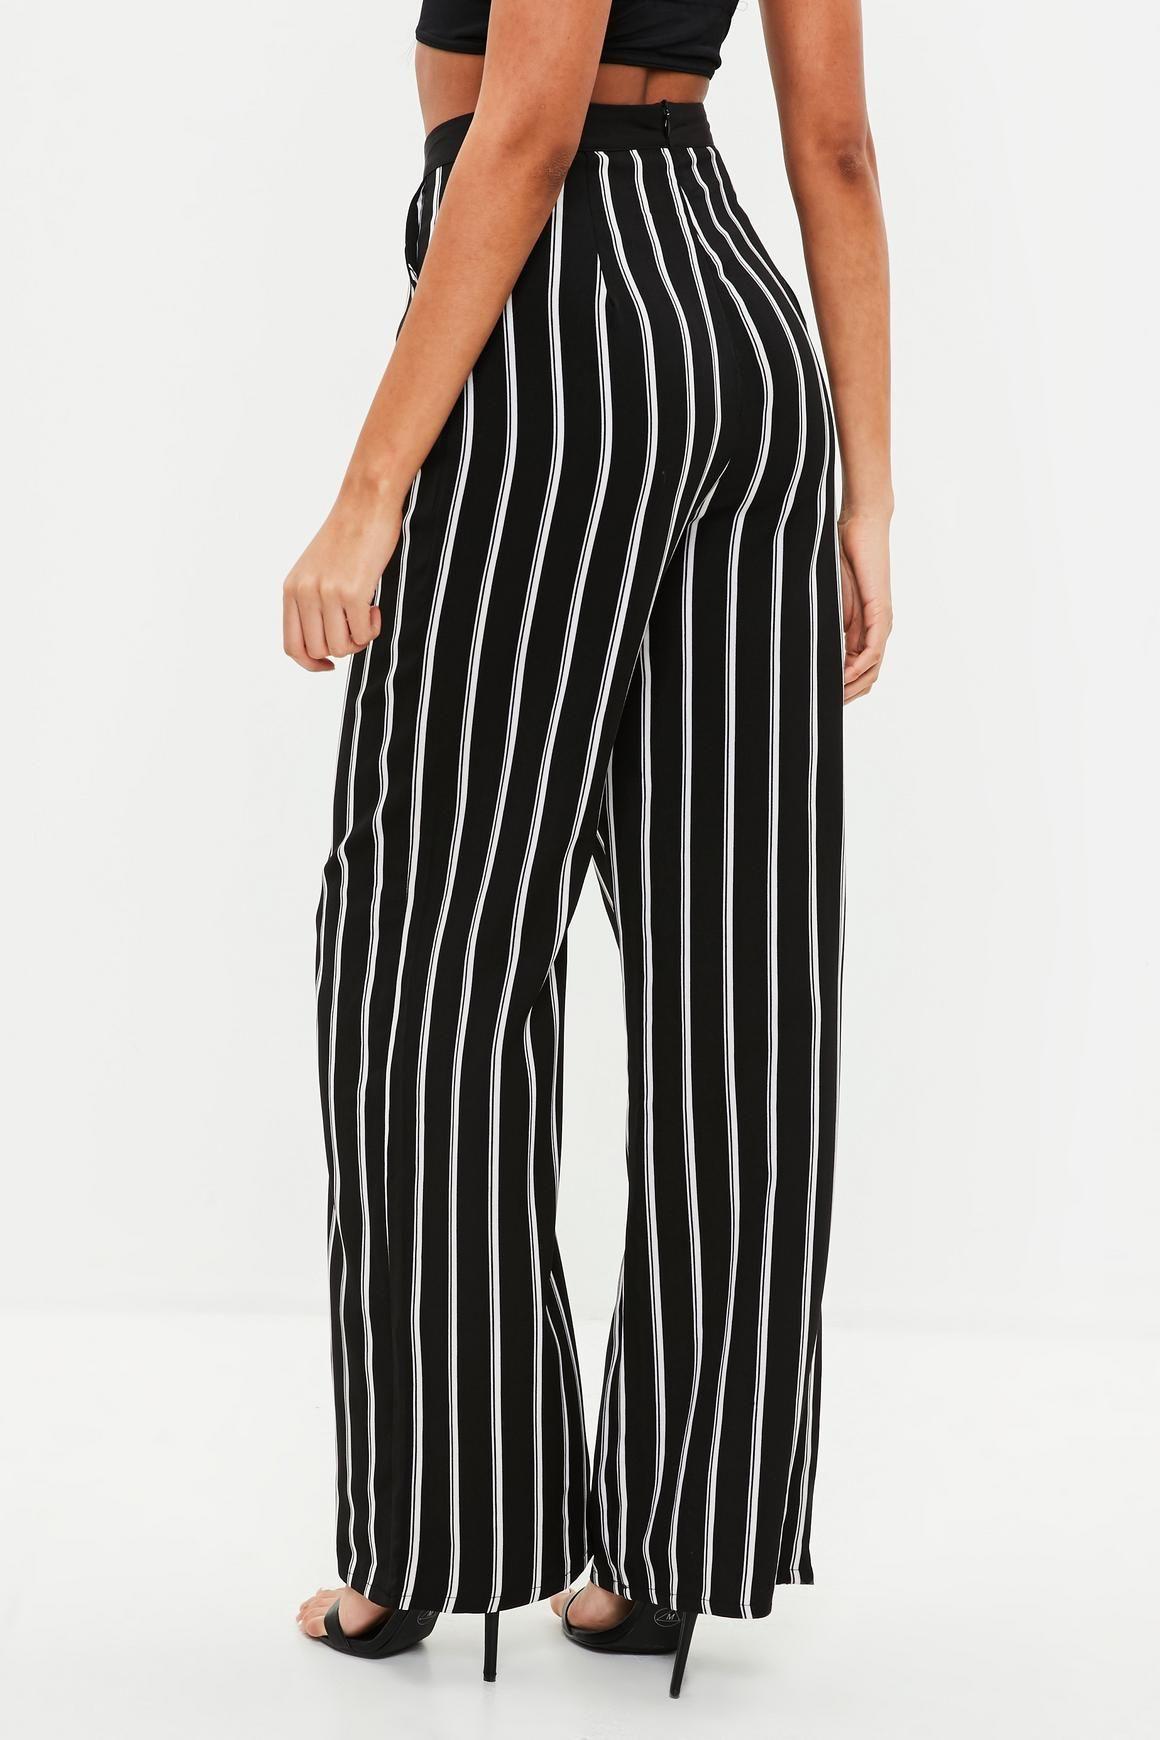 c96efa39b9 Missguided - Black Stripe Wide Leg Pants | Sum 18 | Striped wide leg ...